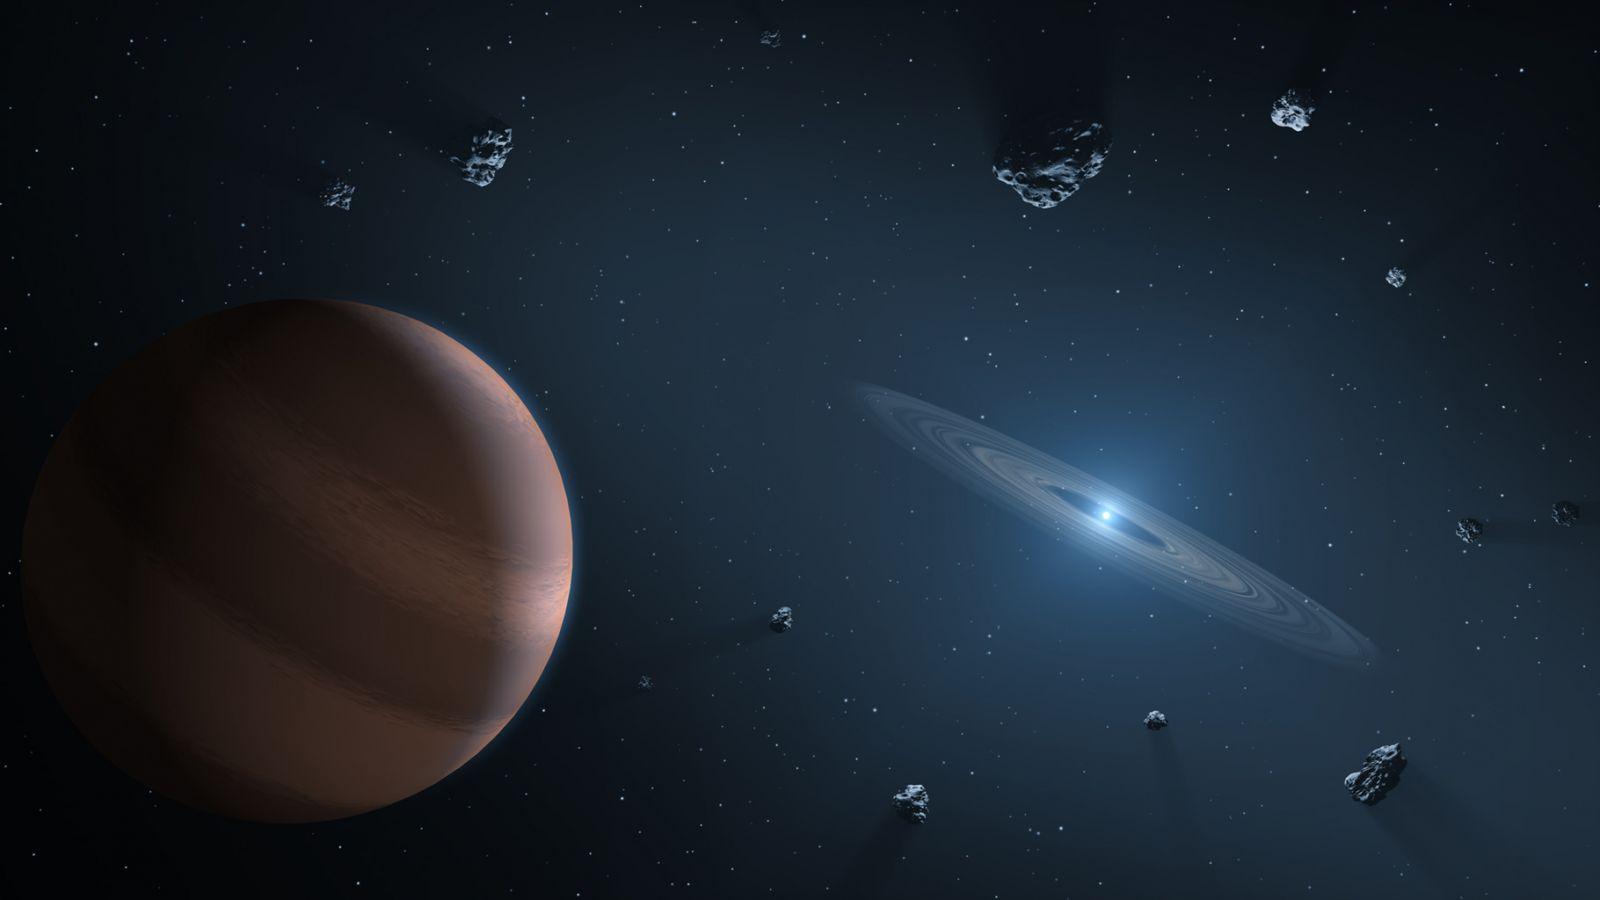 Exoplanets image credit Jet Propulsion Laboratory